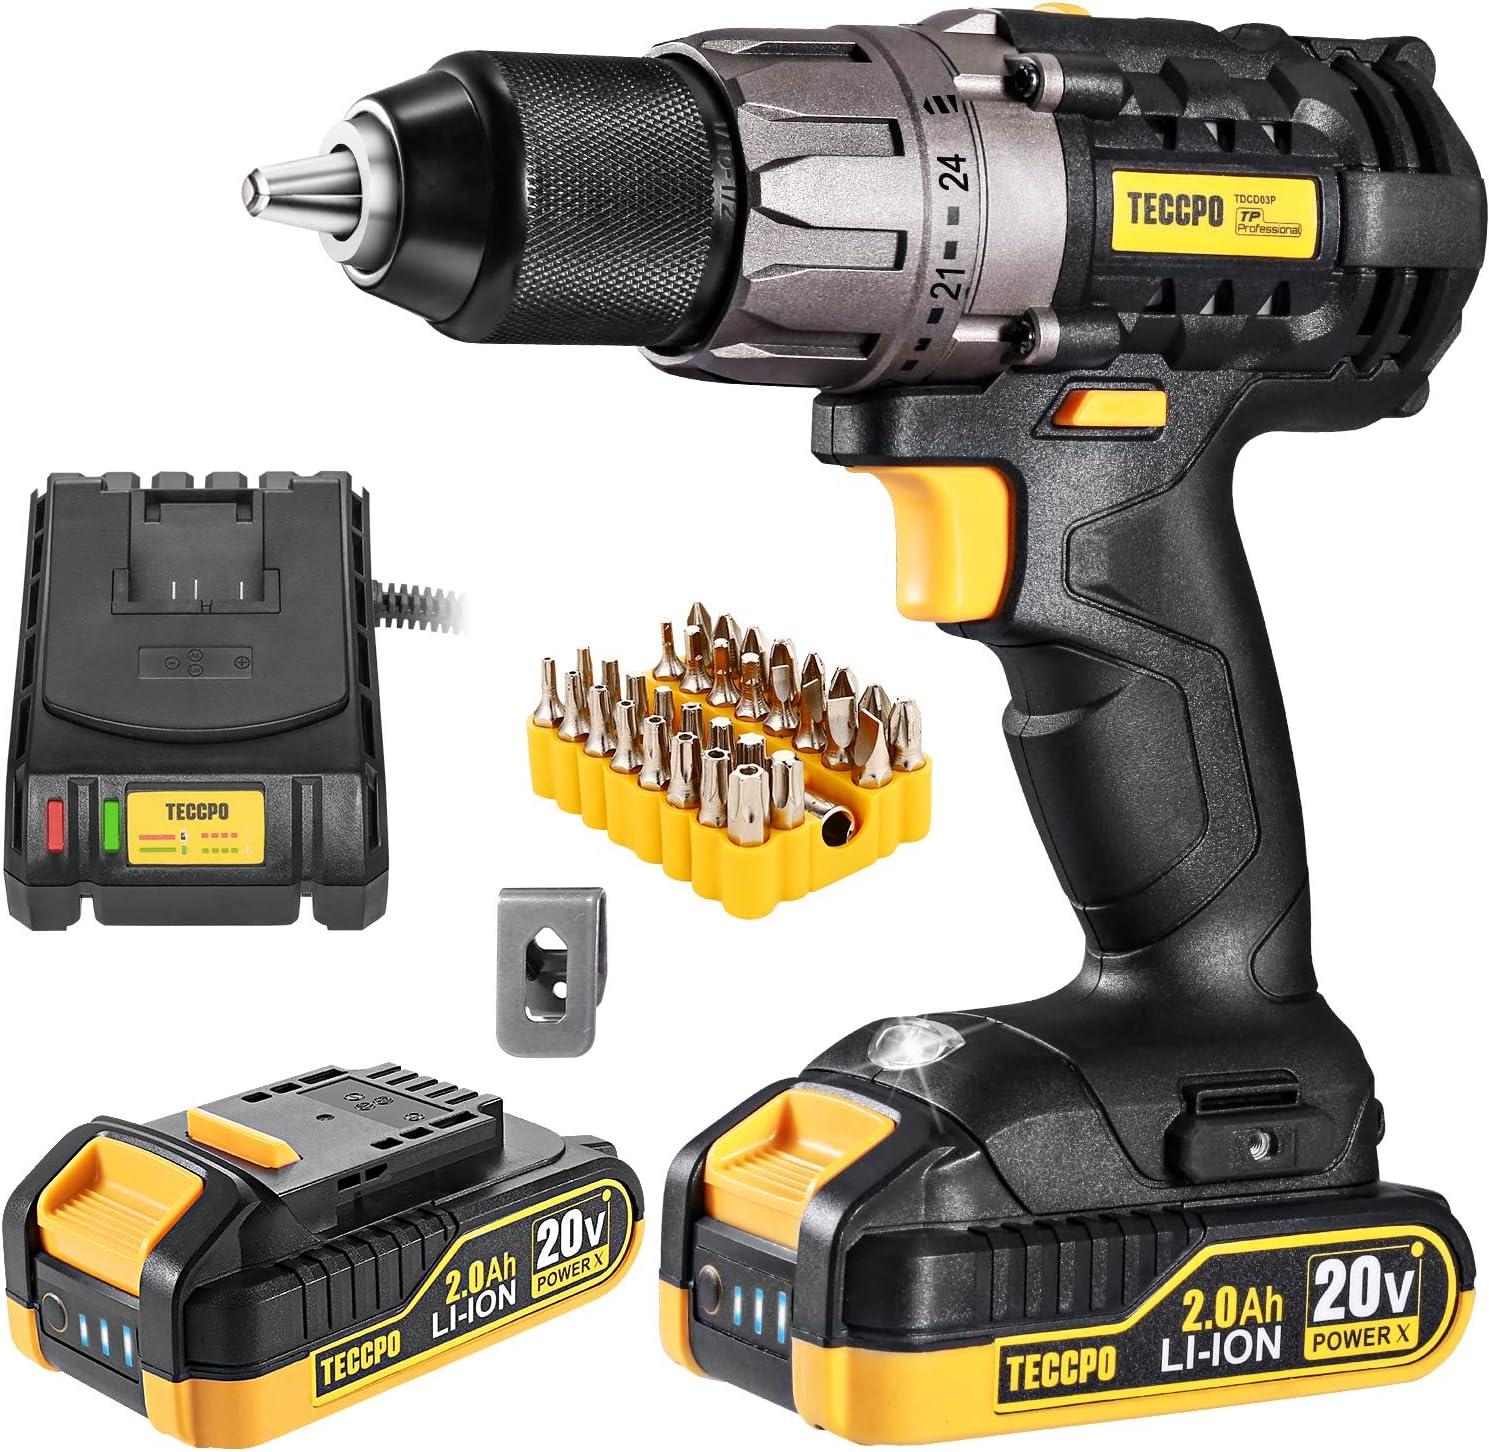 TECCPO 20V 2x2000mAh 33pcs Cordless Drill $59.98 Coupon